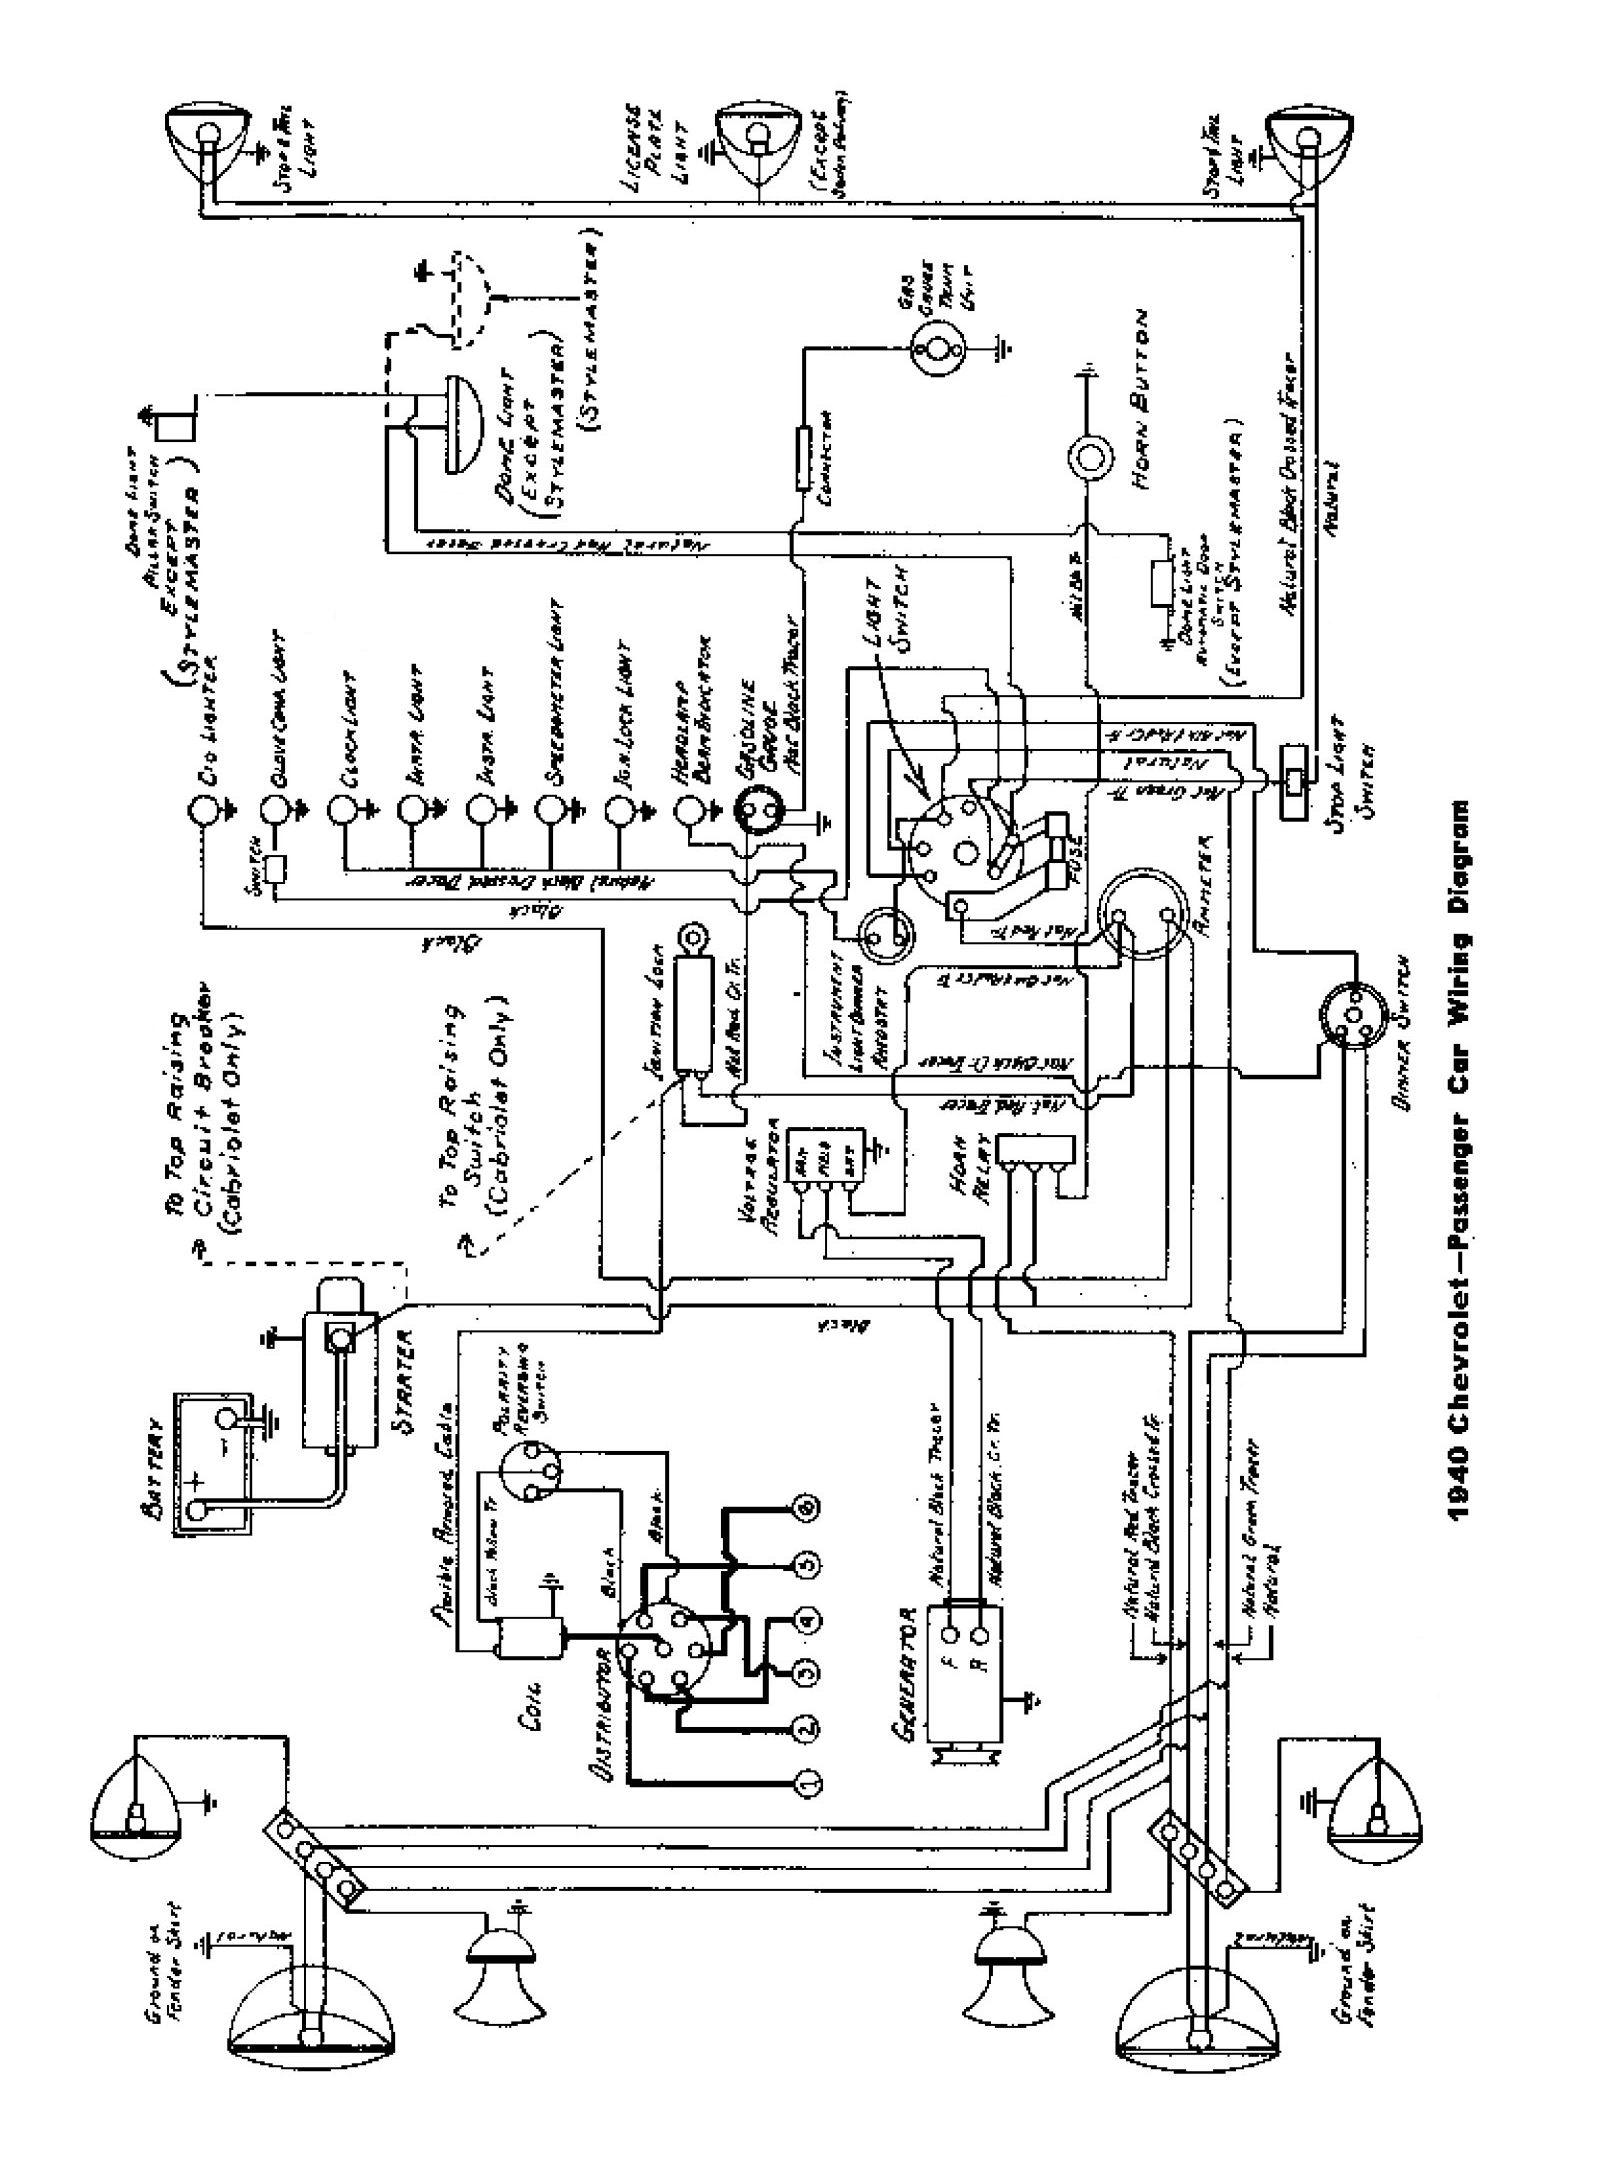 Grhopper Wiring Diagram on electronic circuit diagrams, internet of things diagrams, motor diagrams, hvac diagrams, electrical diagrams, led circuit diagrams, switch diagrams, engine diagrams, gmc fuse box diagrams, sincgars radio configurations diagrams, honda motorcycle repair diagrams, lighting diagrams, snatch block diagrams, smart car diagrams, transformer diagrams, series and parallel circuits diagrams, friendship bracelet diagrams, battery diagrams, pinout diagrams, troubleshooting diagrams,